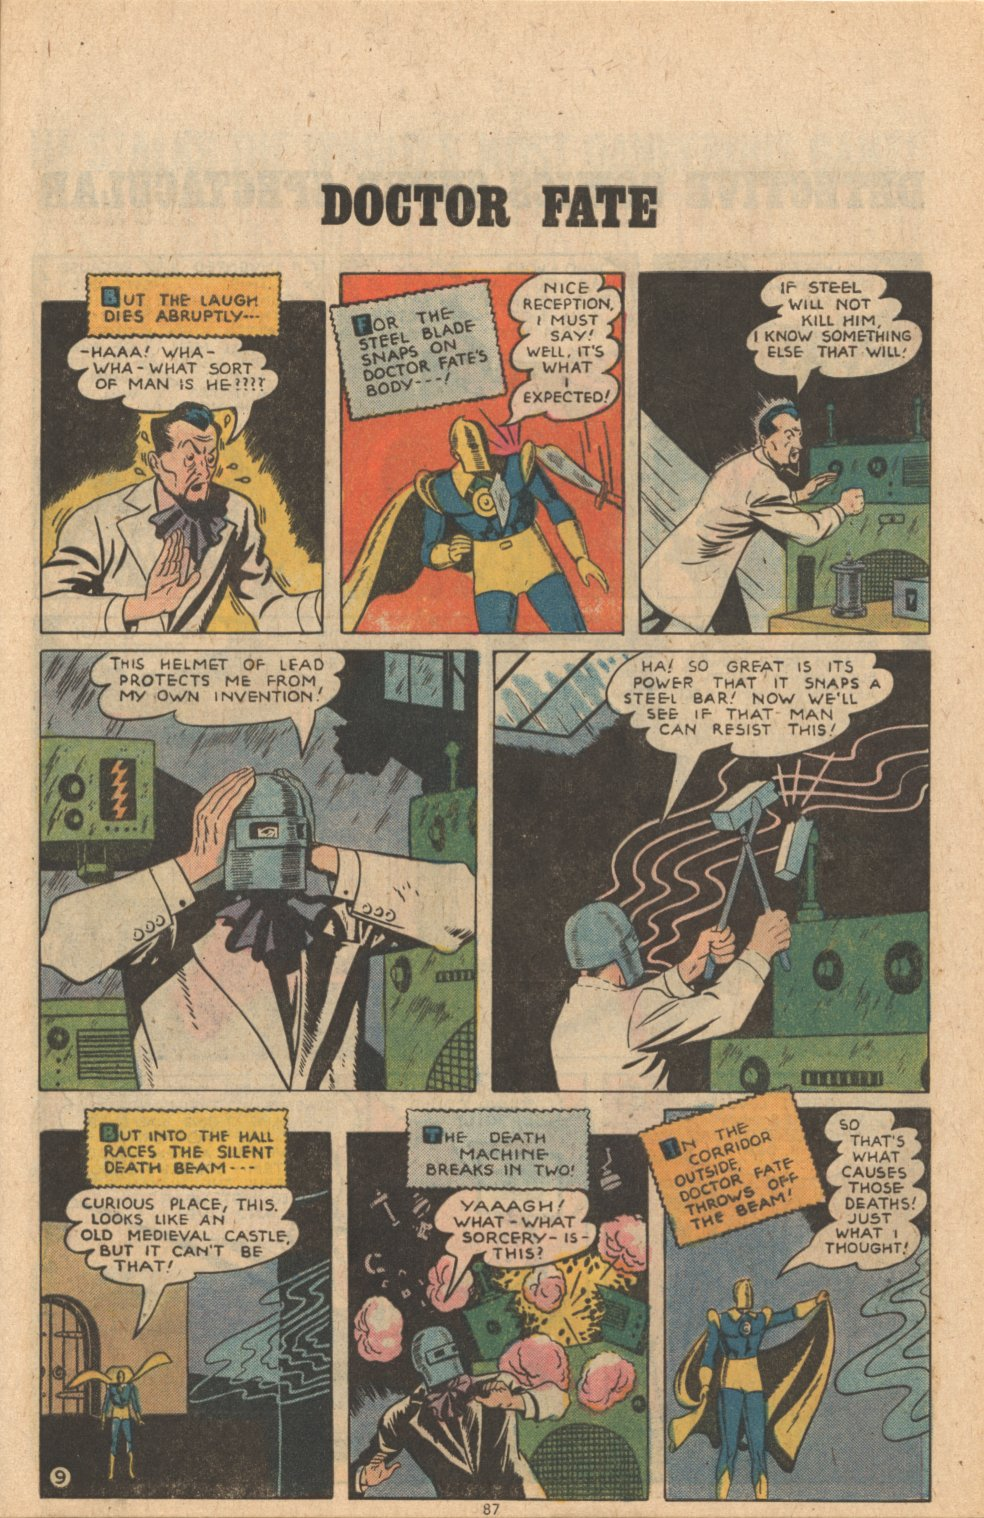 Detective Comics (1937) 442 Page 86